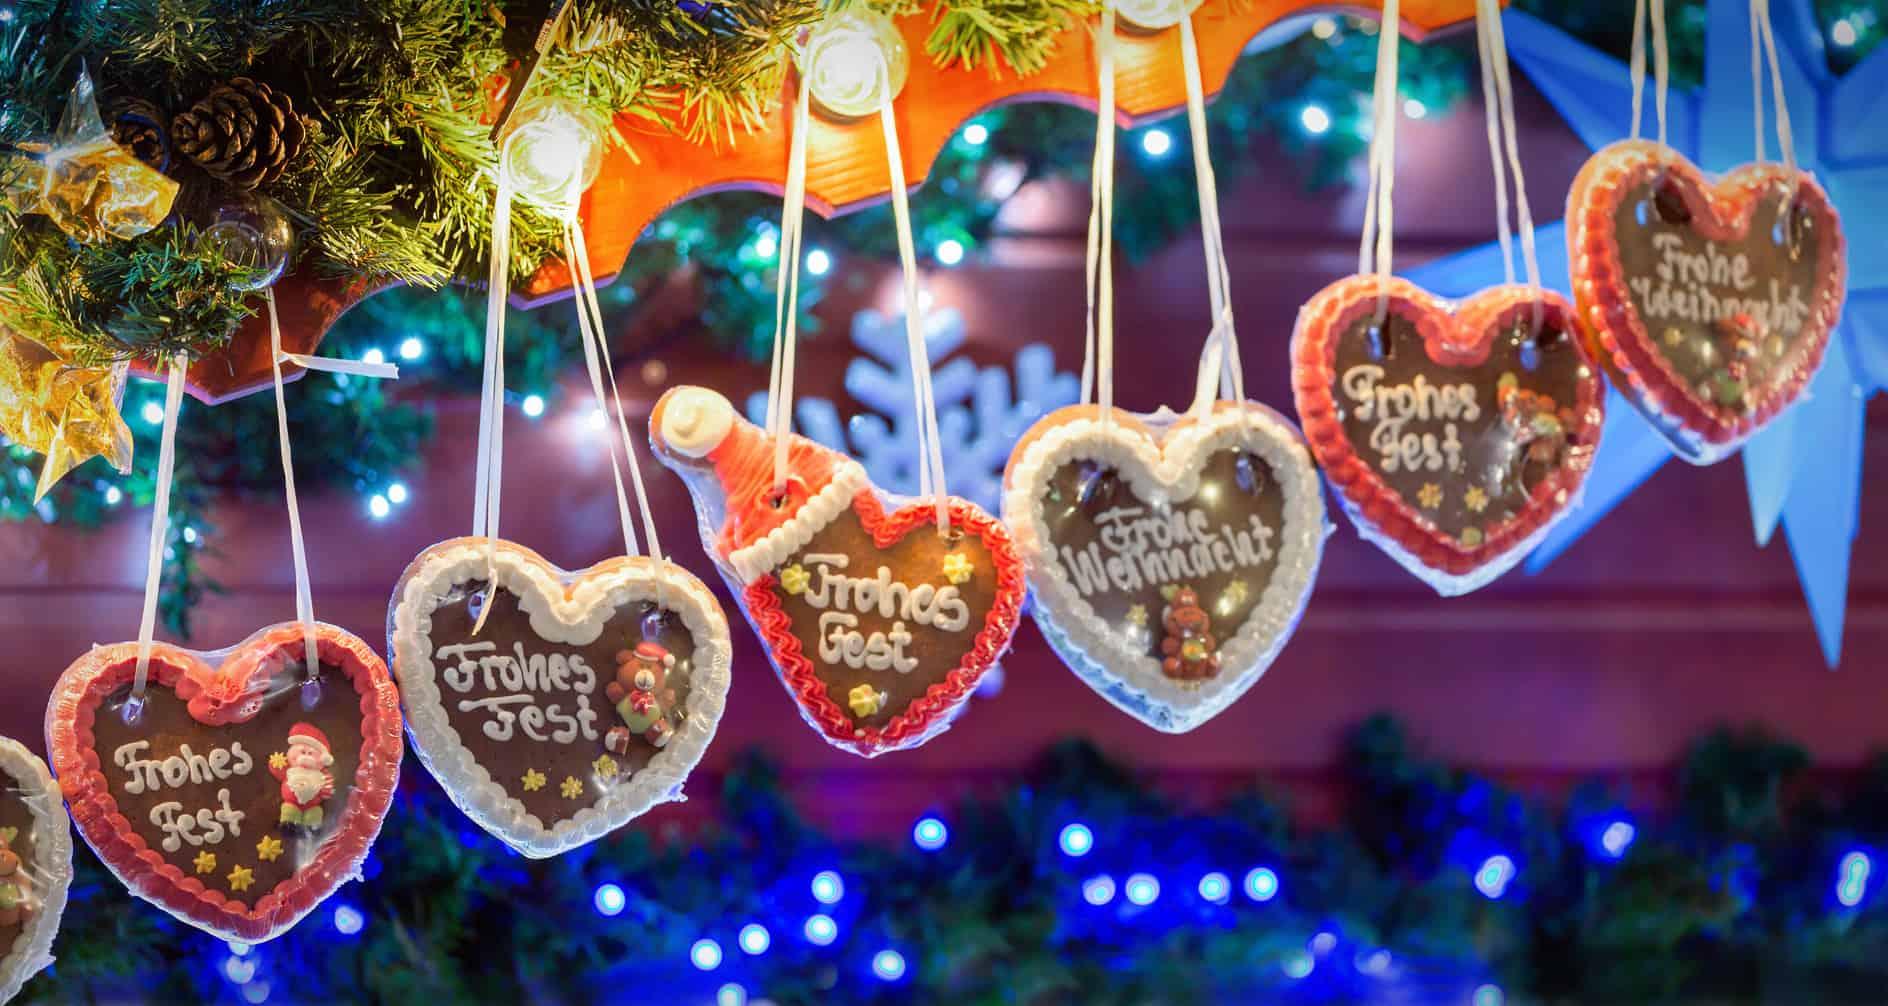 Kerstsfeer Munster Bij Avond Kerstdagtochten Busreizen Paulusma